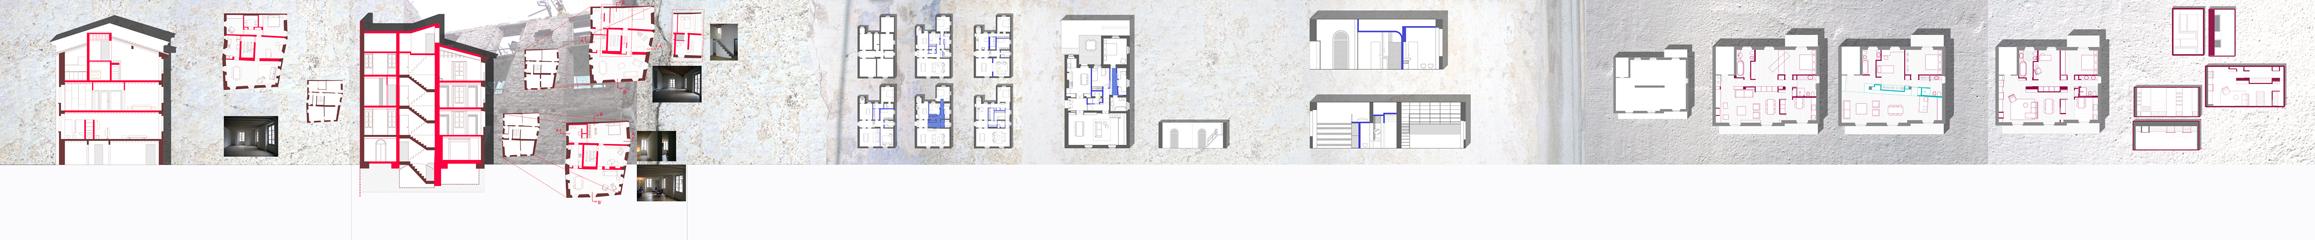 http://albertozecchini.com/files/gimgs/32_1-marzo.jpg